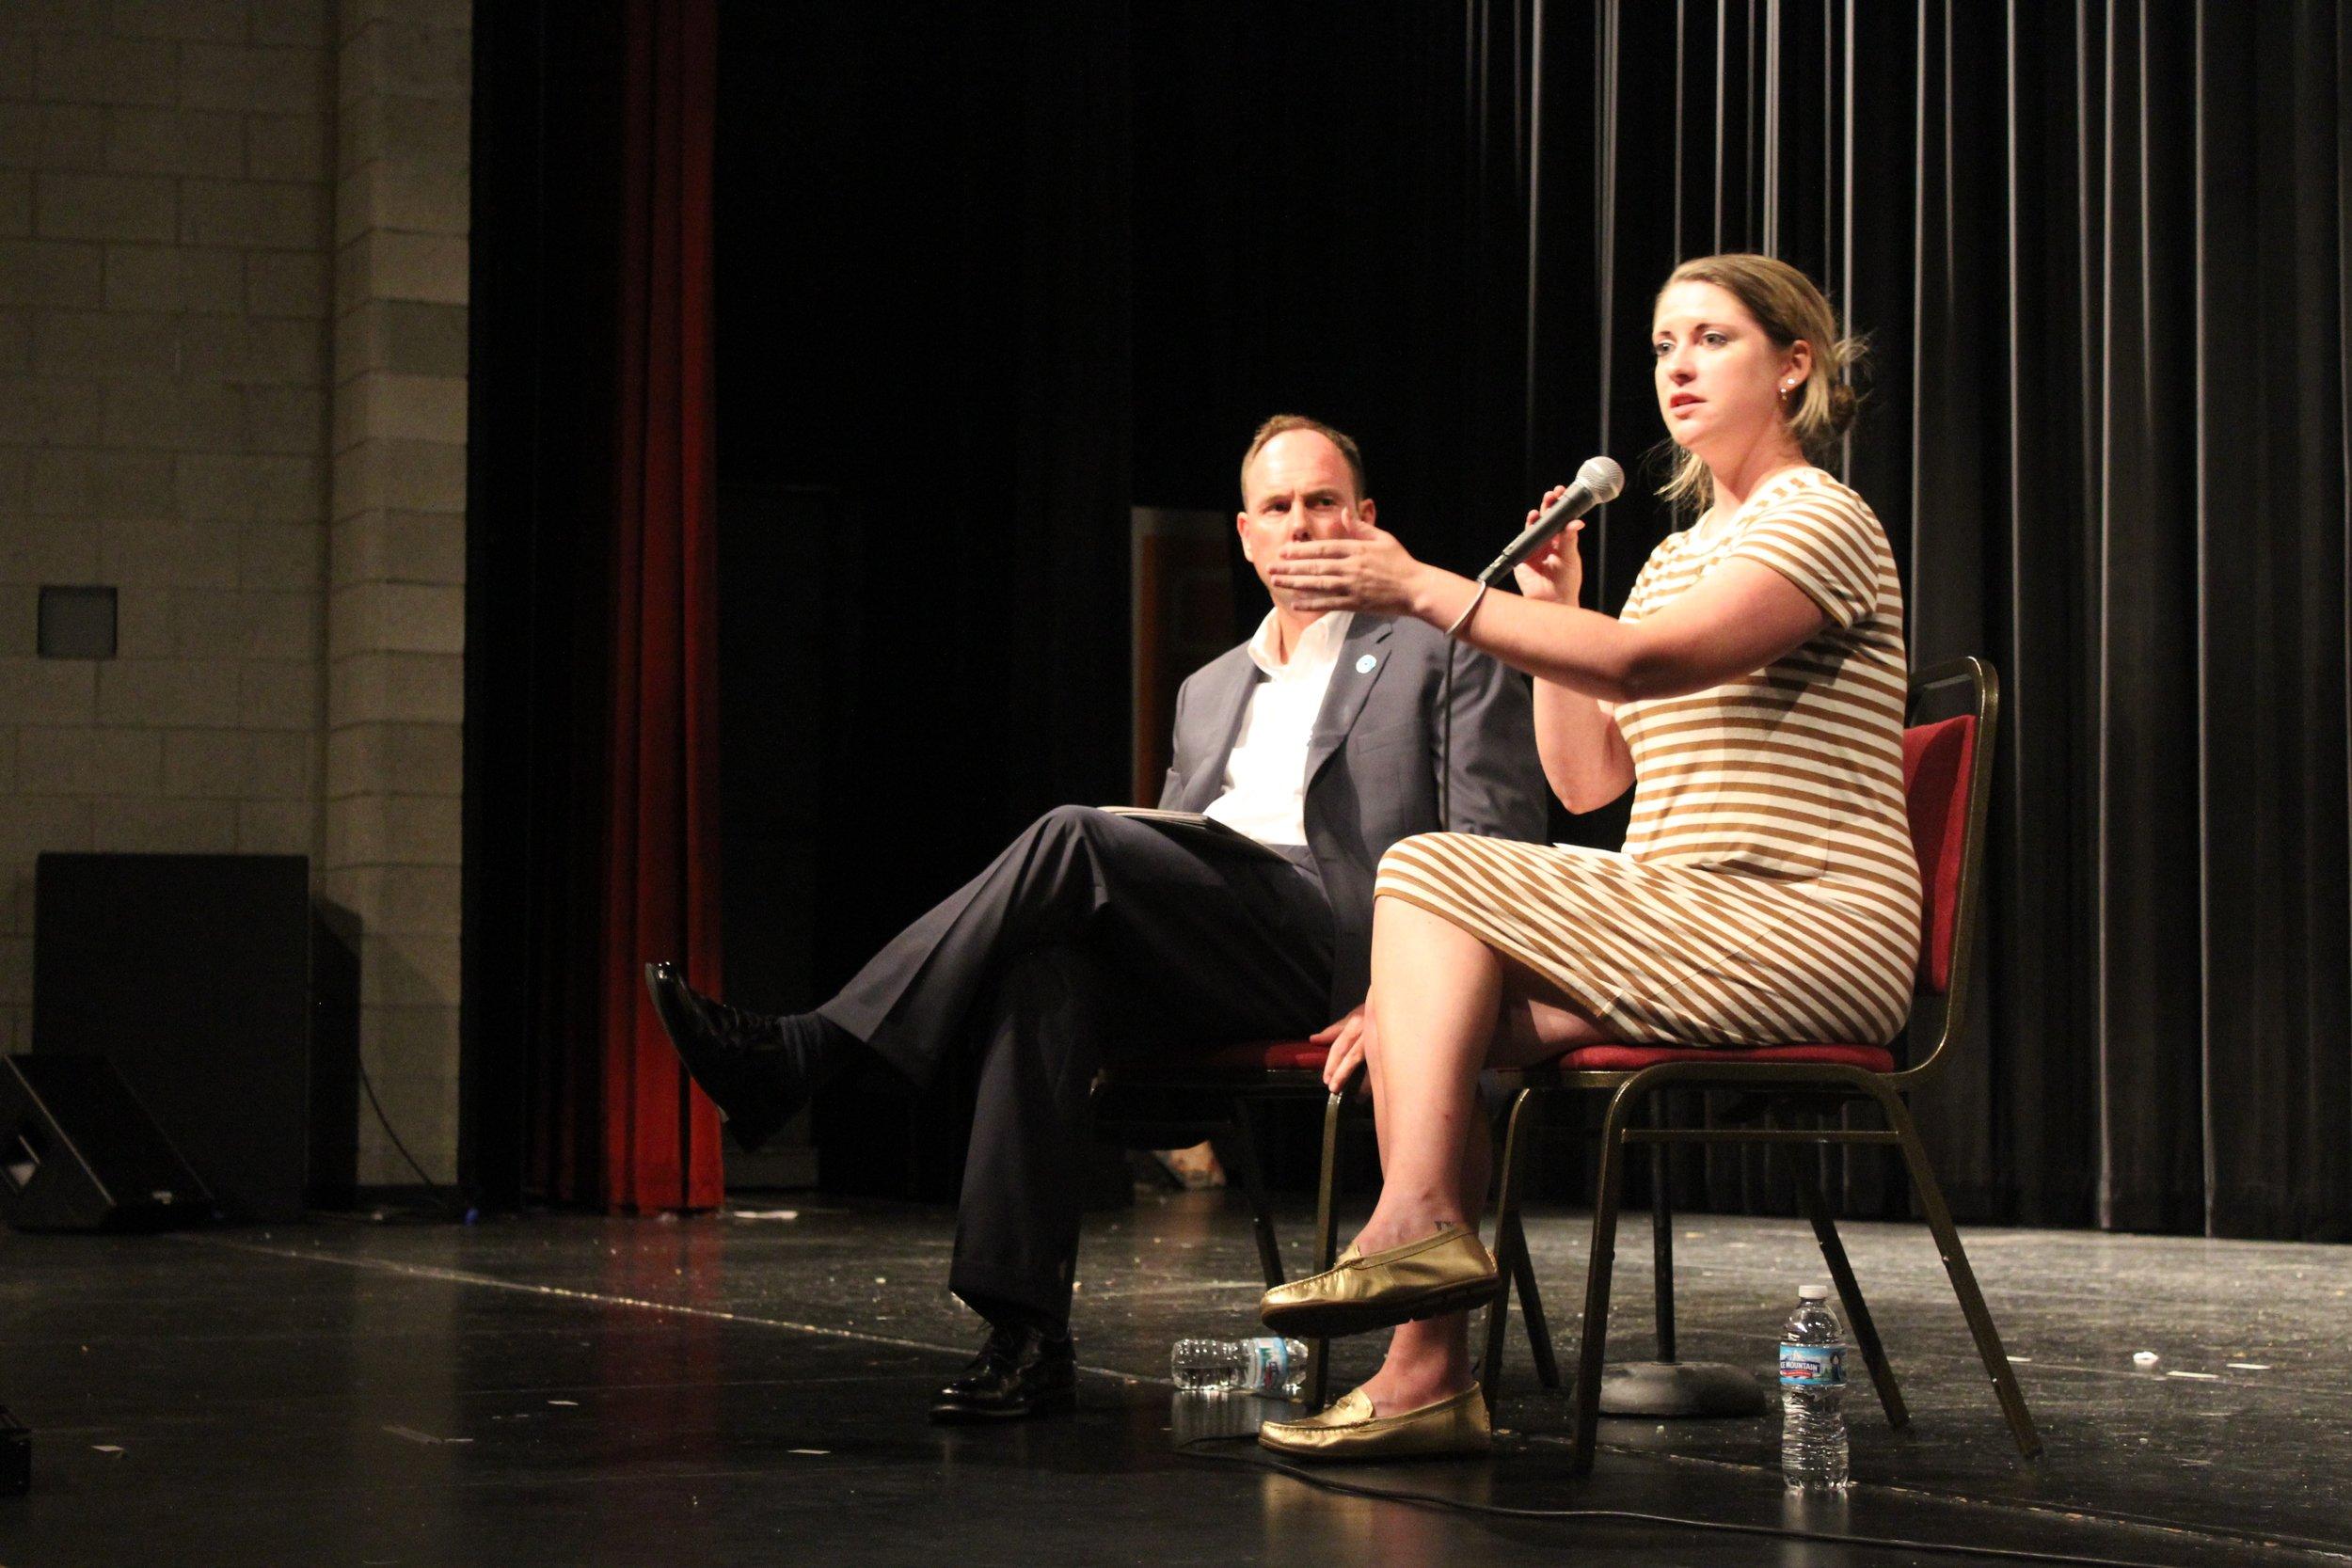 Annie Speaks alongside Alderman O'Shea at the screening in Beverly